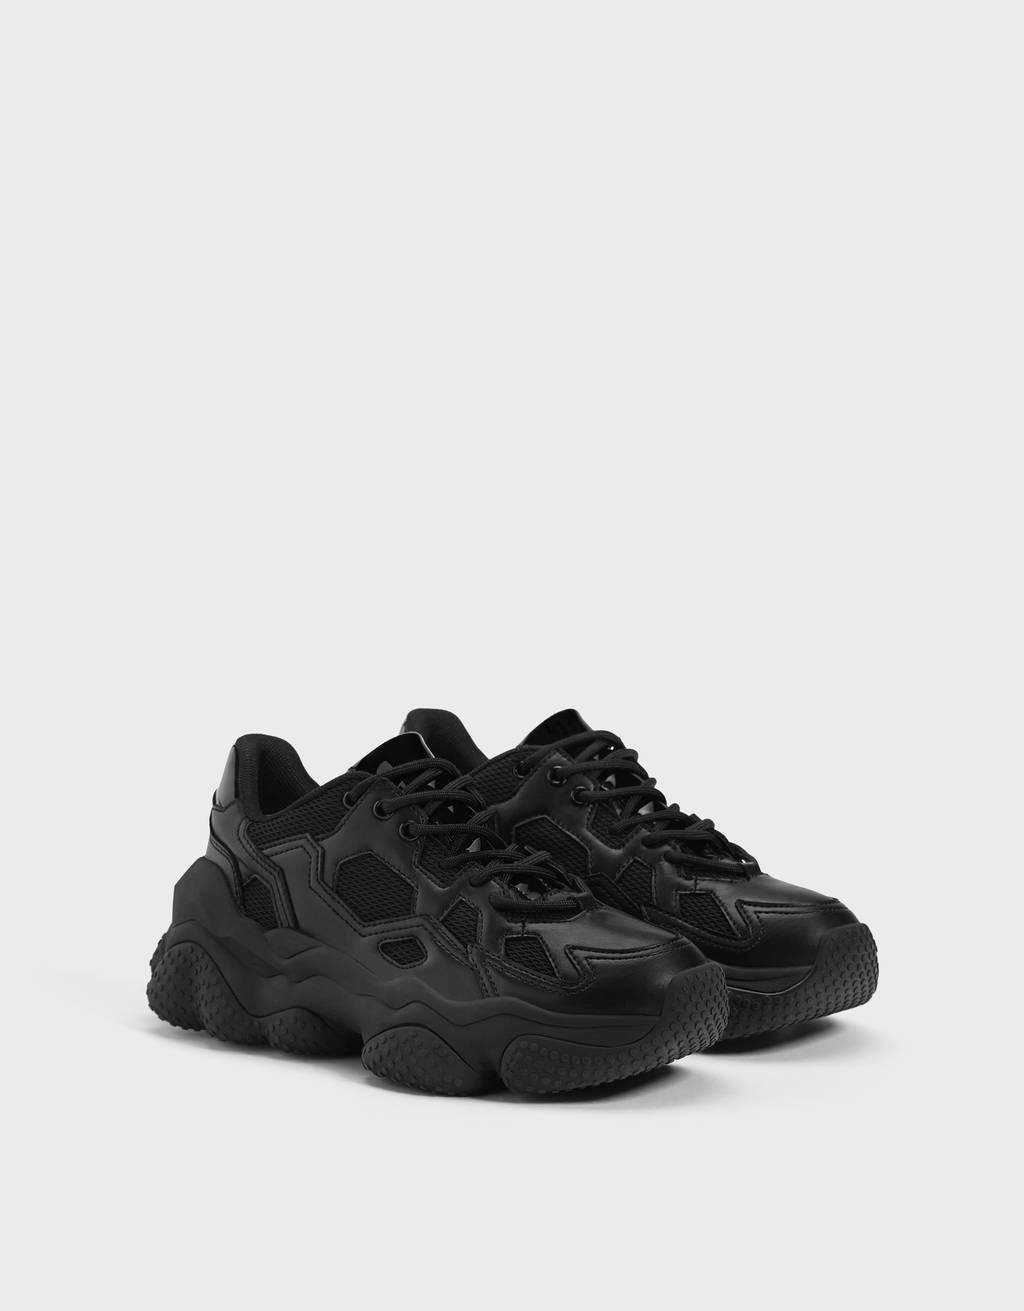 Sneaker Billie Eilish x Bershka mit XL-Sohle